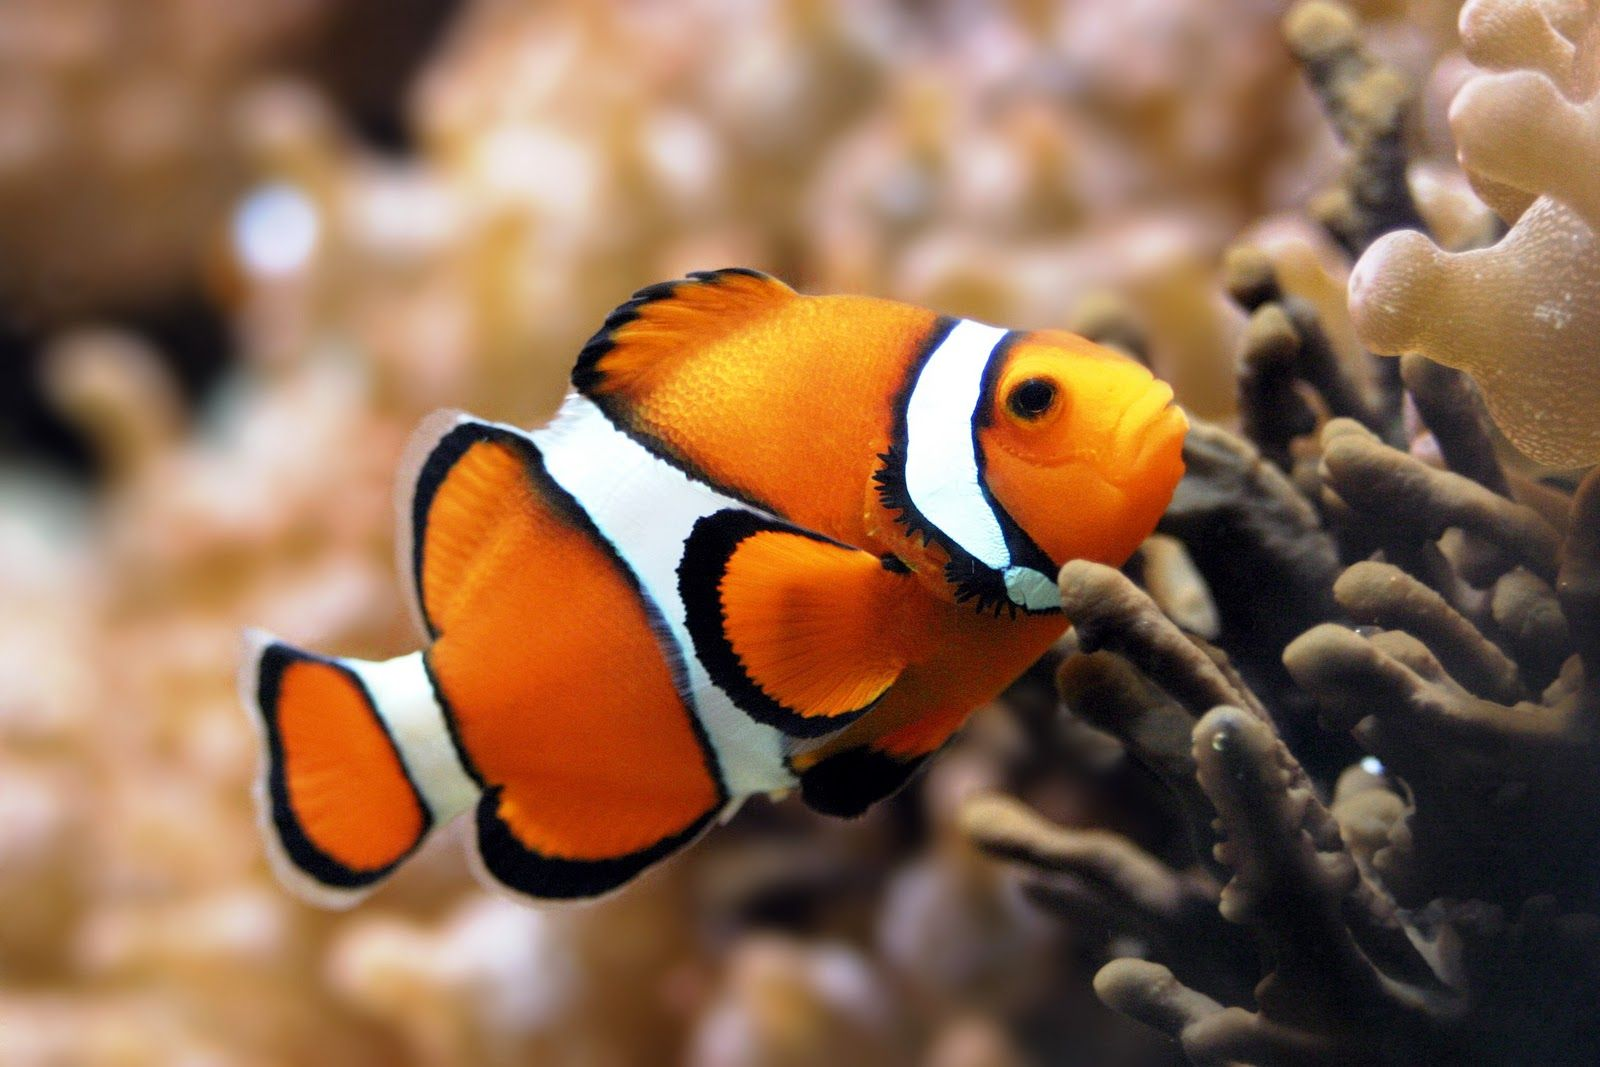 Bird Flower And Fish Clown Fish Marine Fish Clown Fish Animals